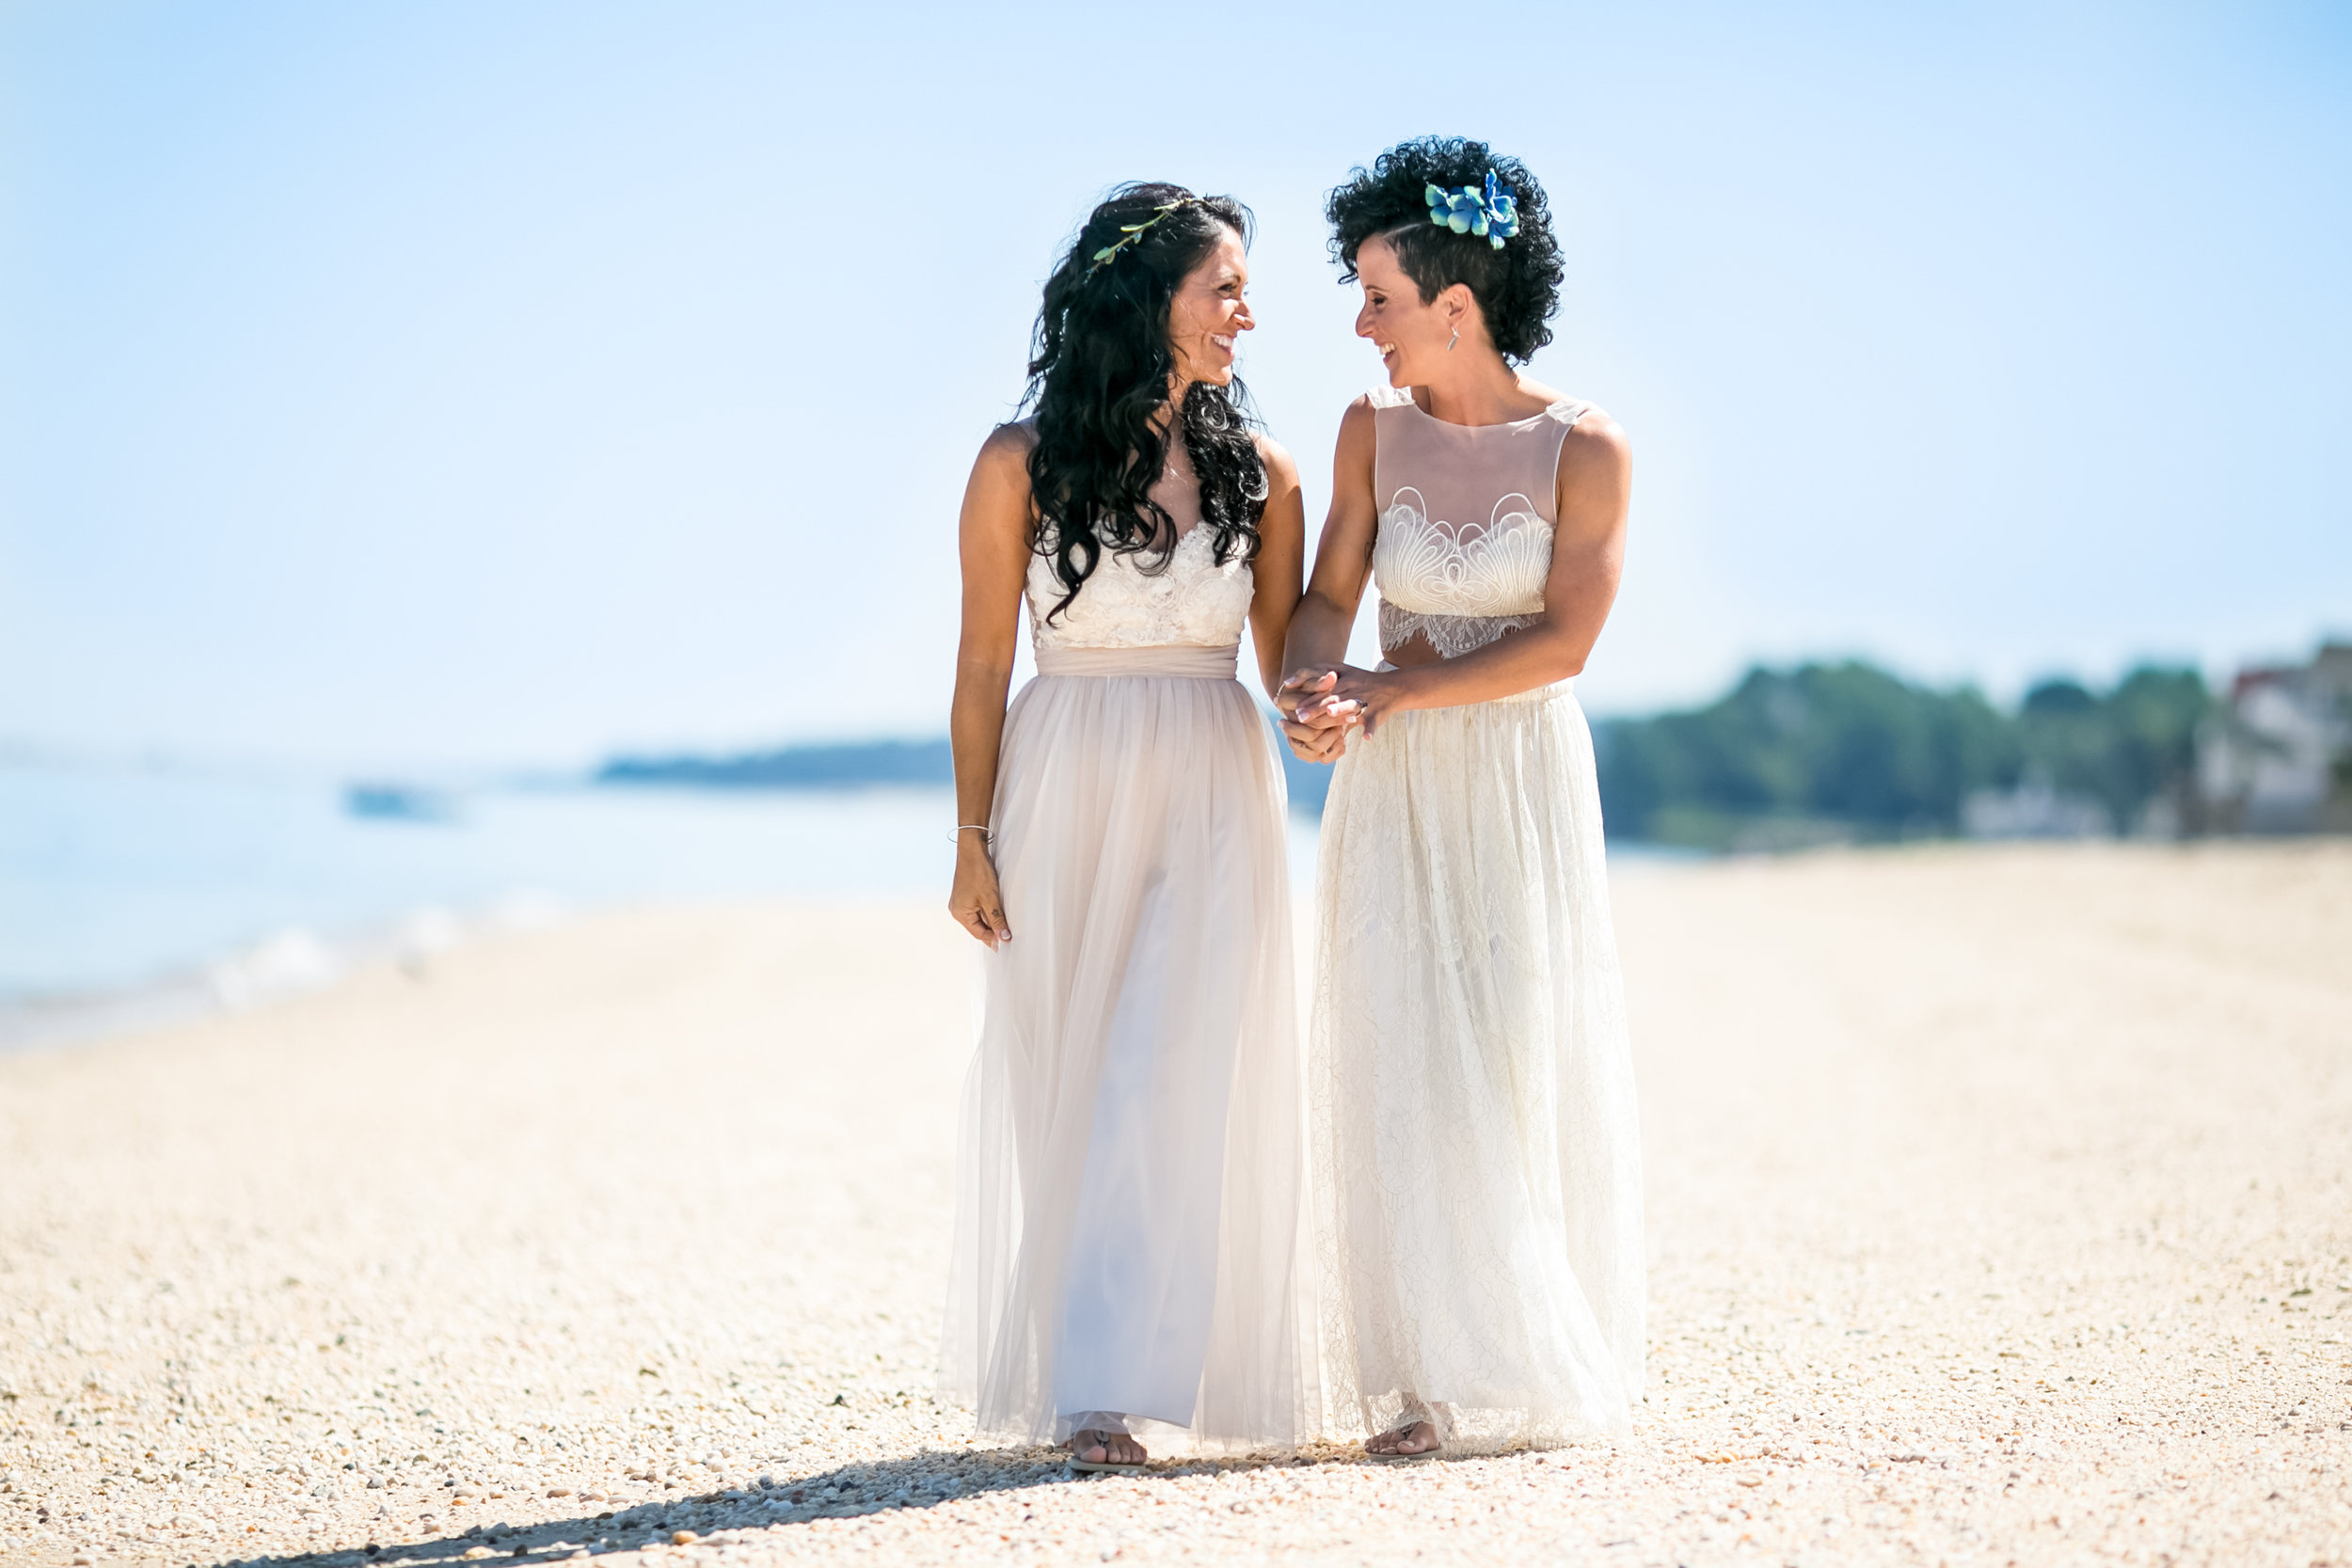 Sarah_and_Simone_WeddingReedit-27.jpg